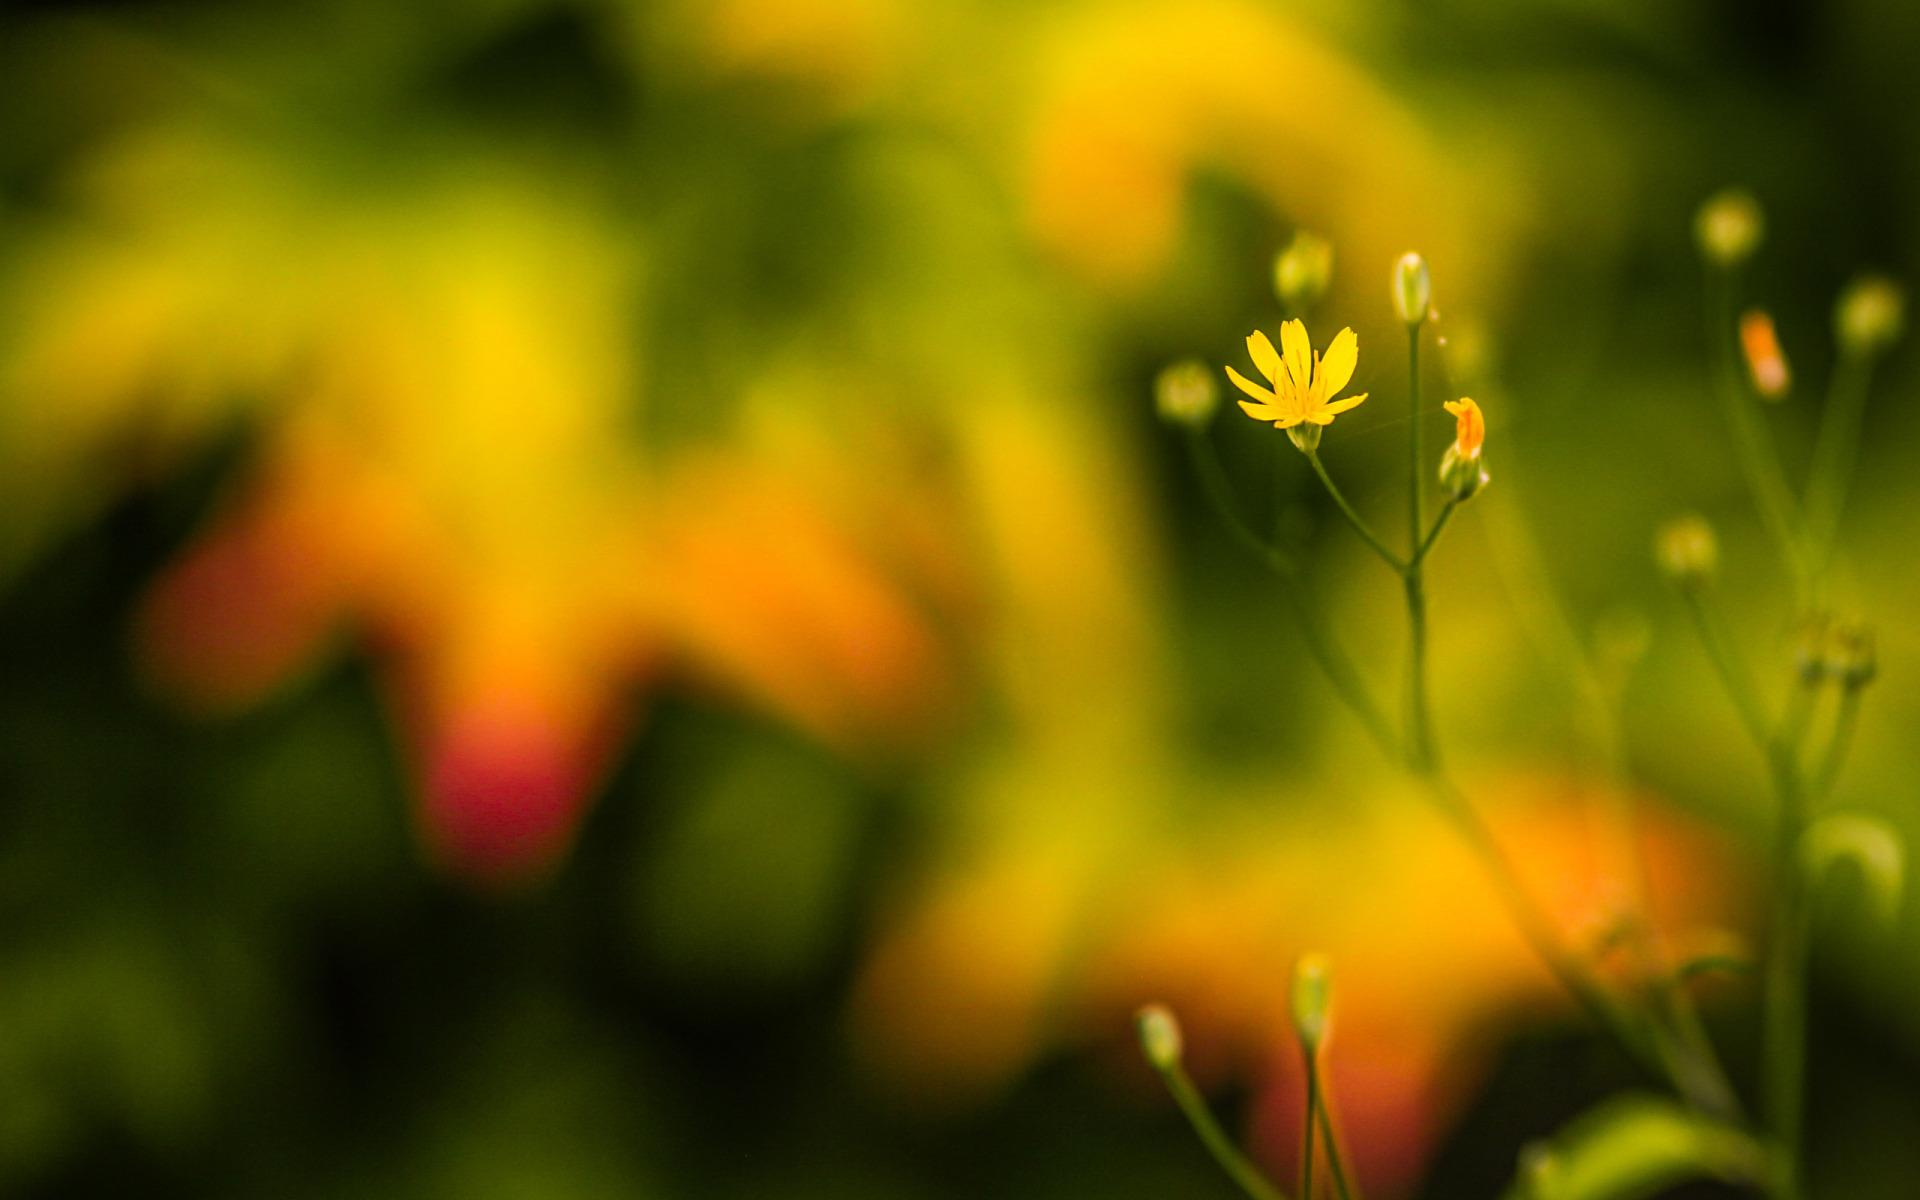 Macro Flowers Wallpaper